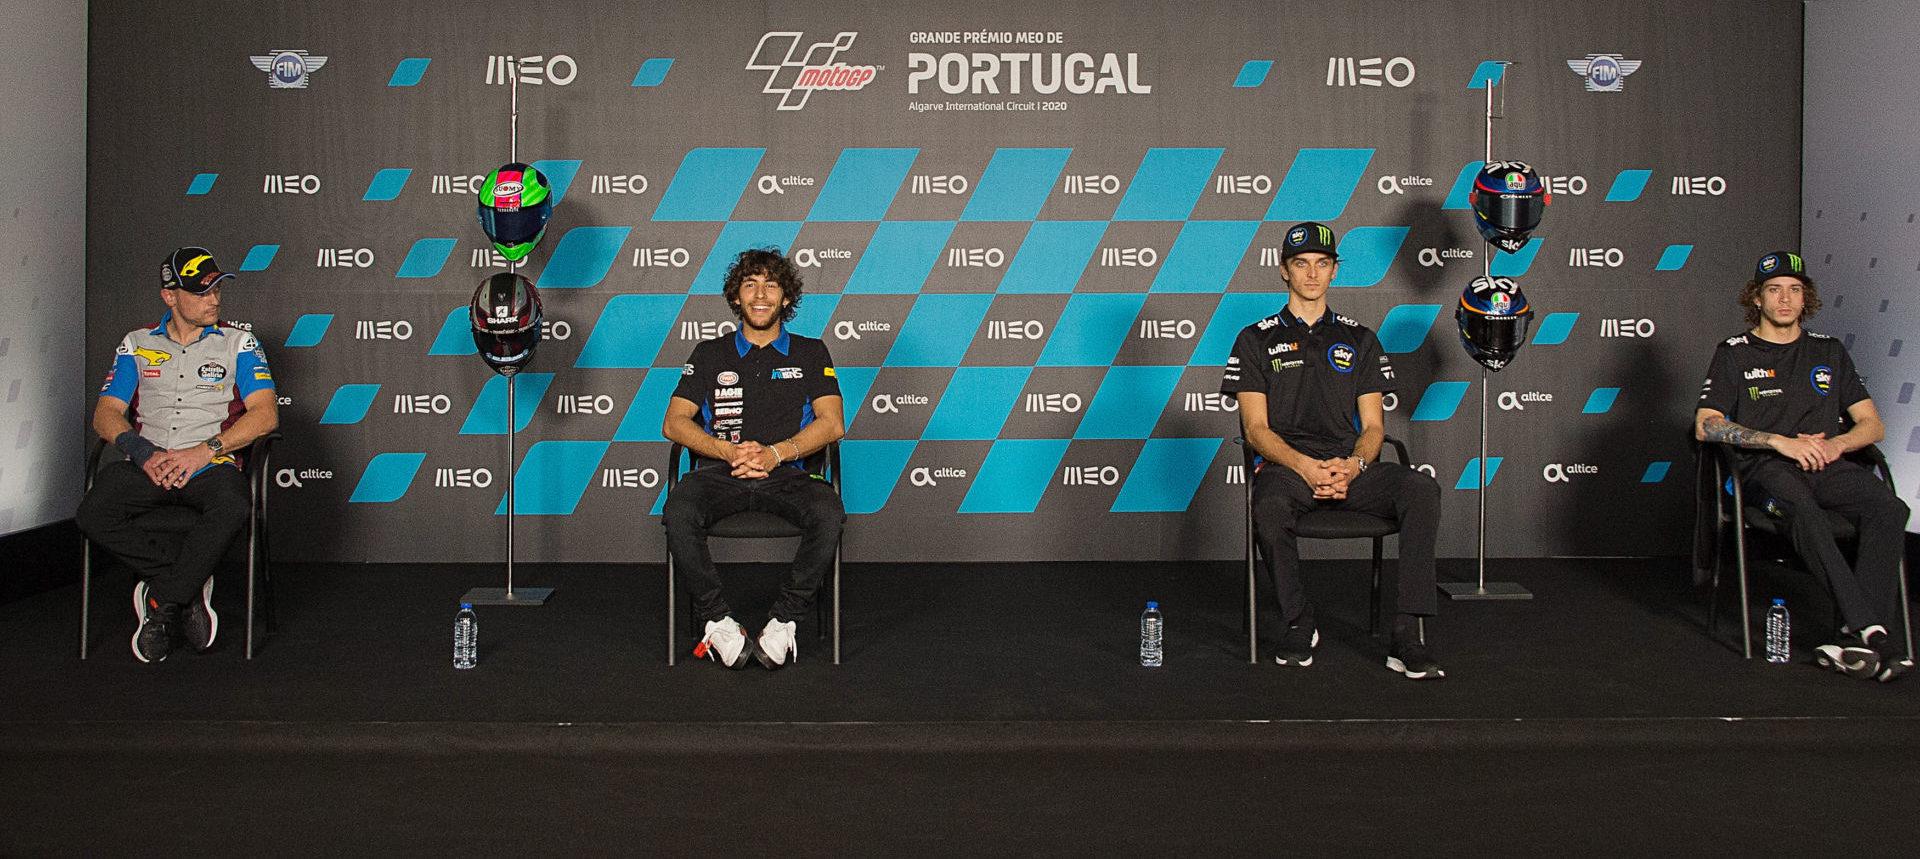 2020 Moto2 World Championship contenders (from left): Sam Lowes, Enea Bastianini, Luca Marini, and Marco Bezzecchi. Photo courtesy Dorna.